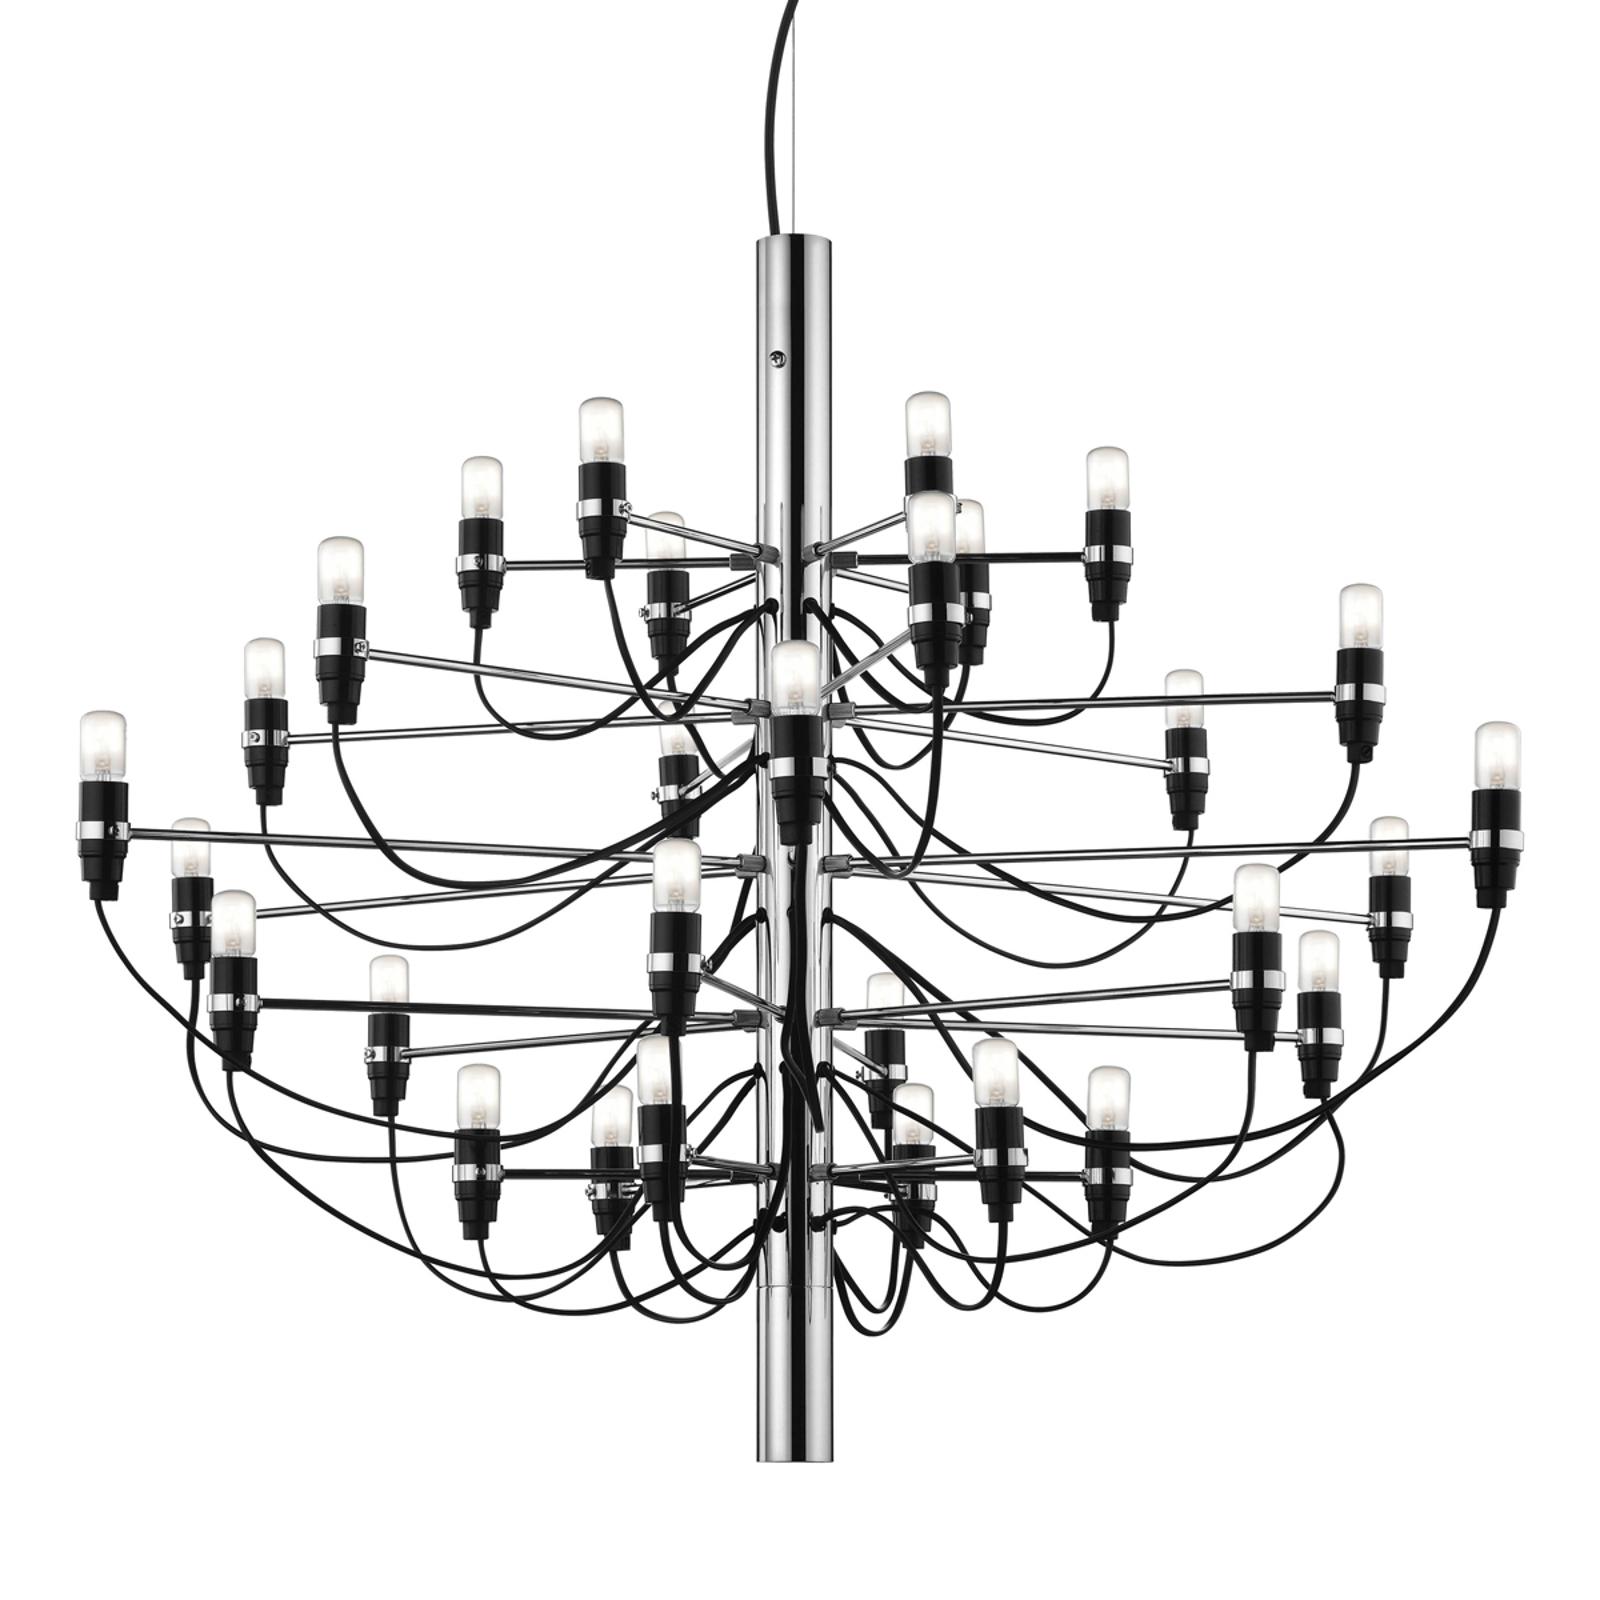 2097 - lampadario a 50 bracci, cromo